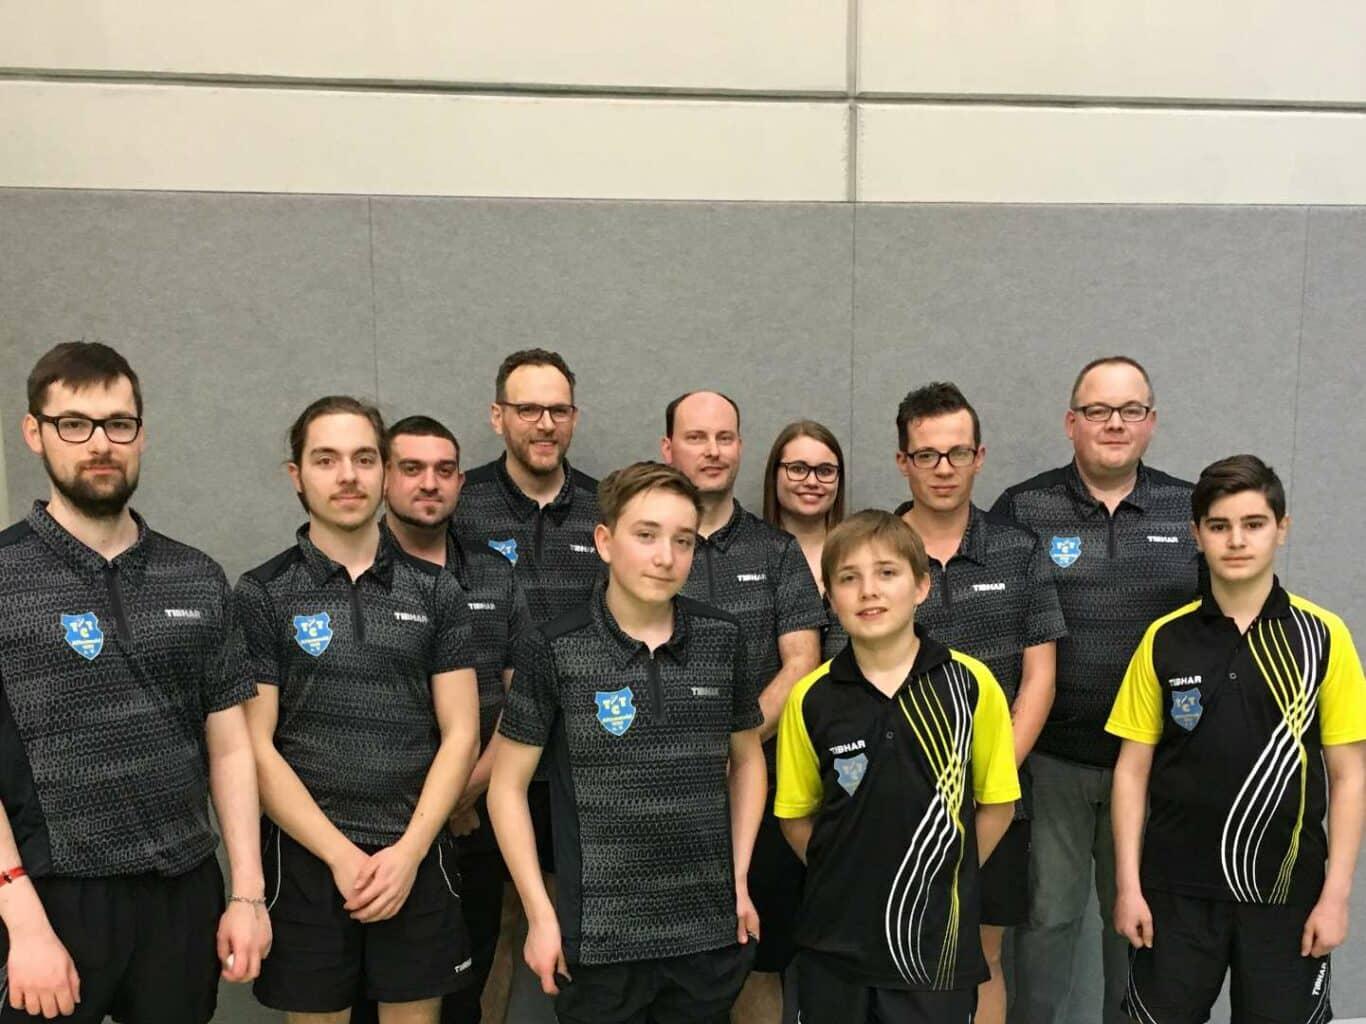 Meistermannschaft des TTC Altenwald | Bild: Florian Kern